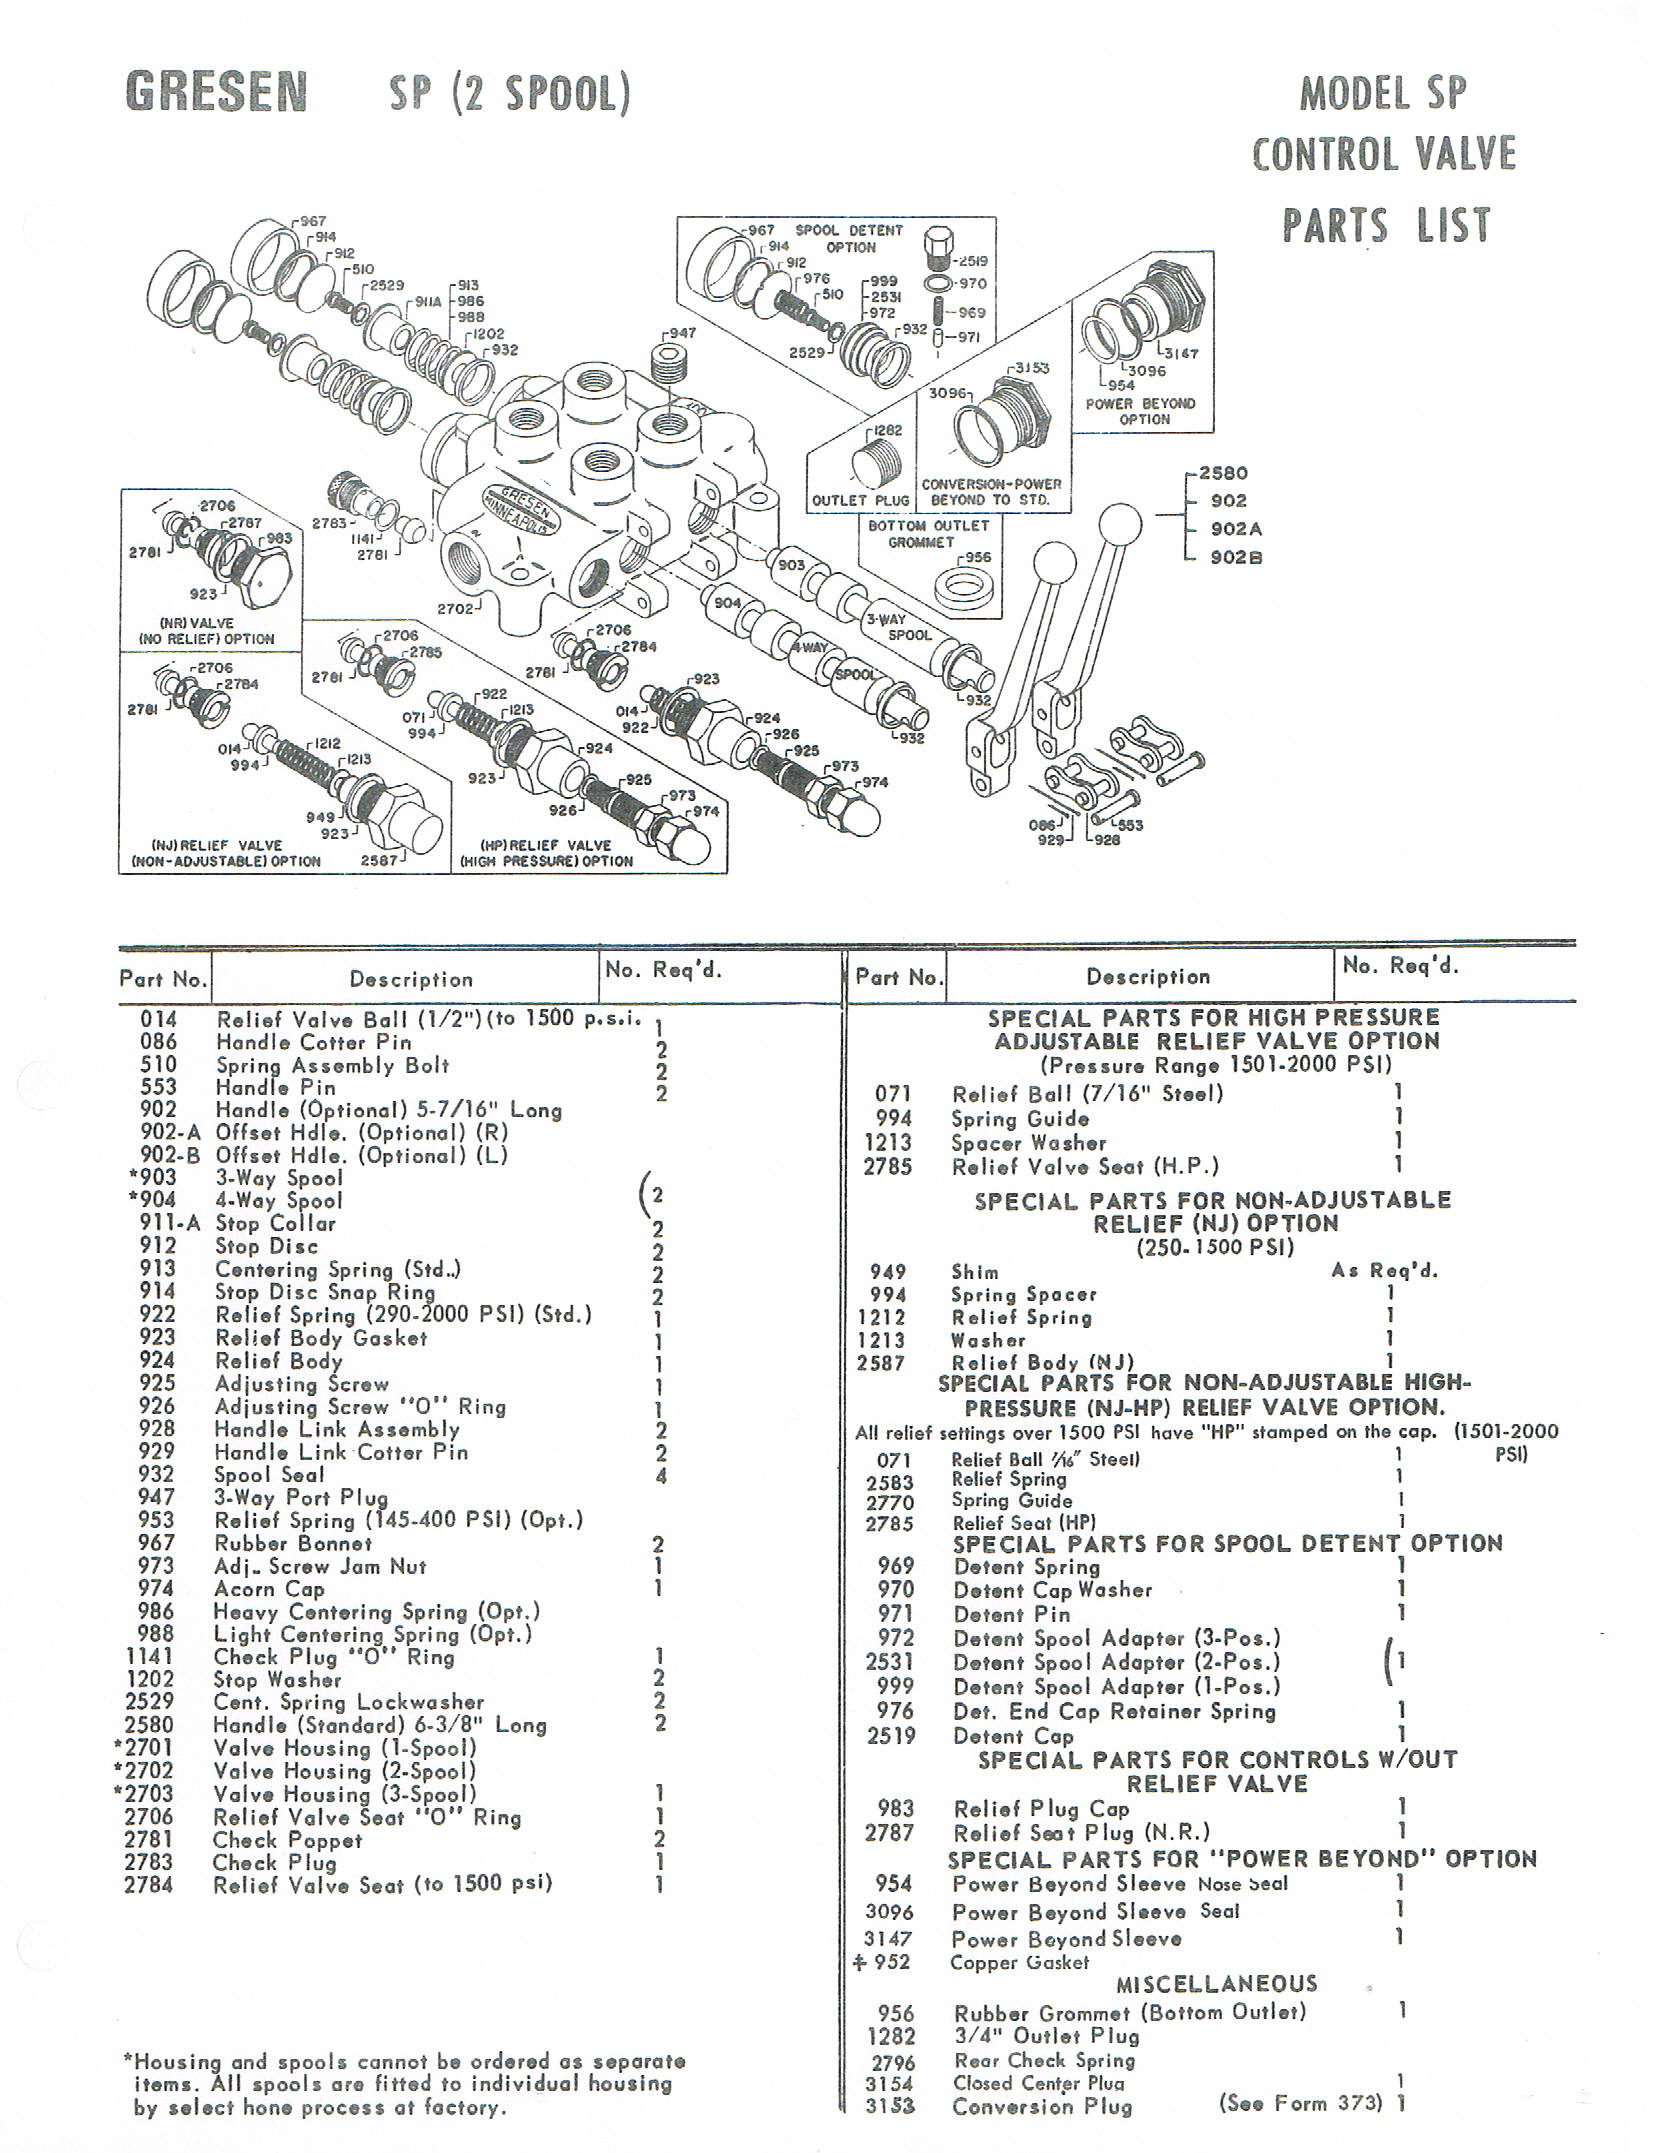 Mellott Manufacturing Co., Inc.